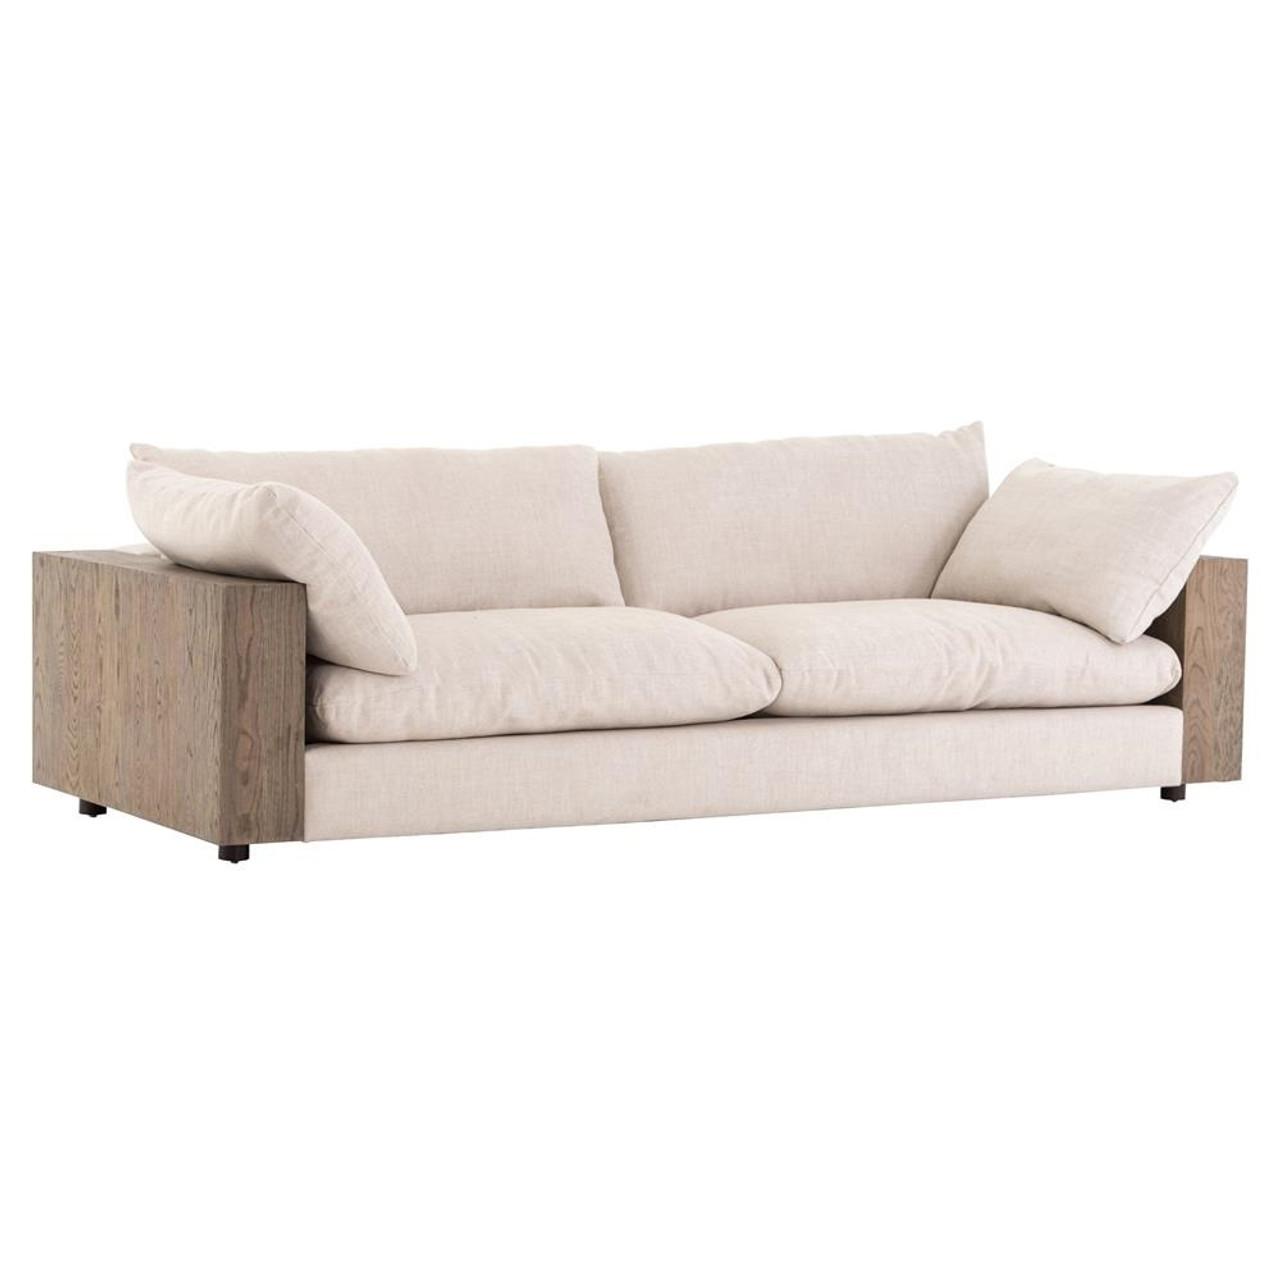 Merveilleux Bernard Cushion Back Exposed Oak Wood Frame Sofa